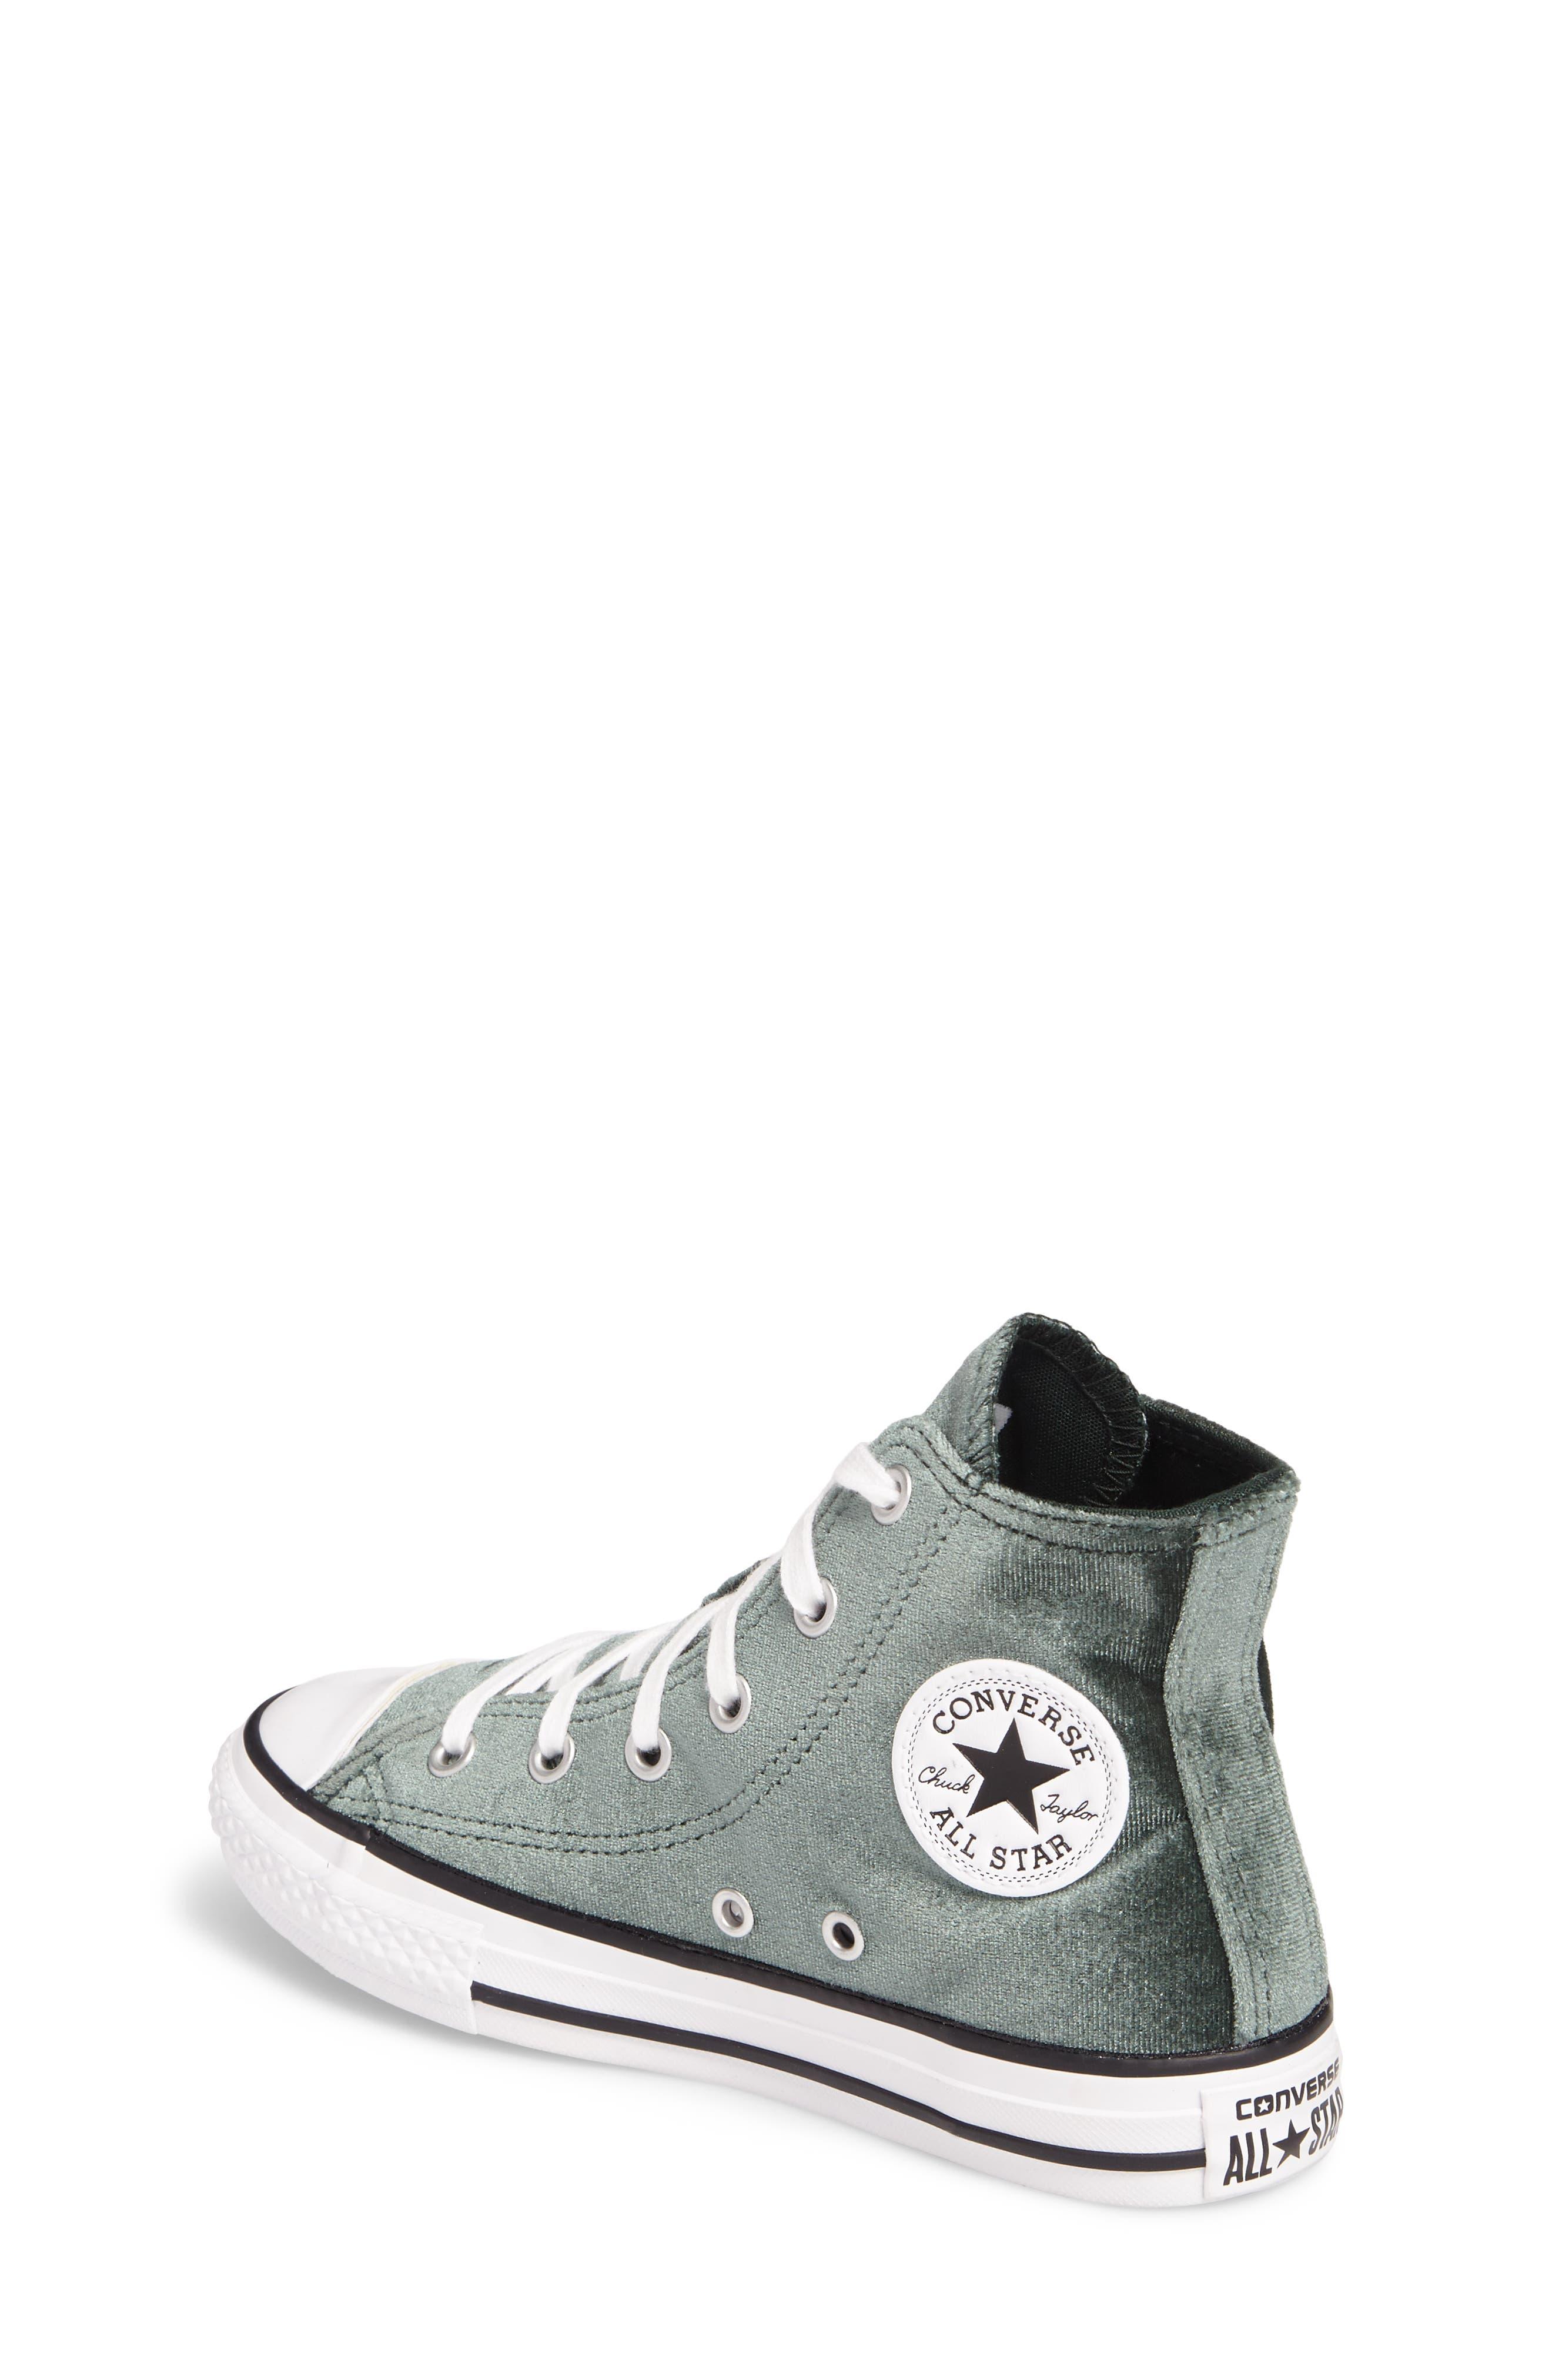 Alternate Image 2  - Converse Chuck Taylor® All Star® Velvet High Top Sneaker (Toddler, Little Kid & Big Kid)